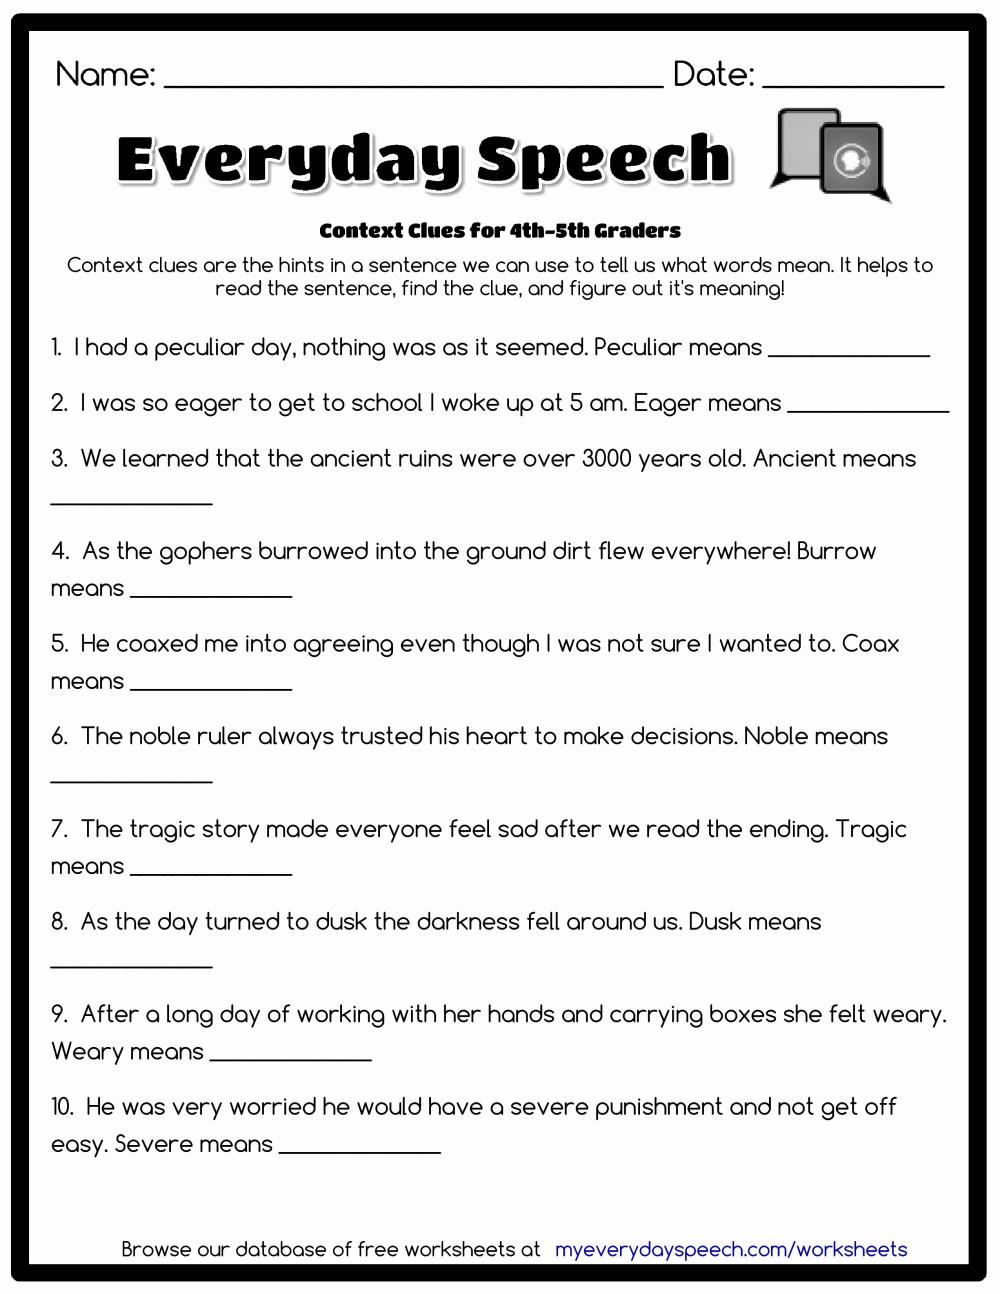 medium resolution of Grammar Worksheet 3rd Grade   www.robertdee.org